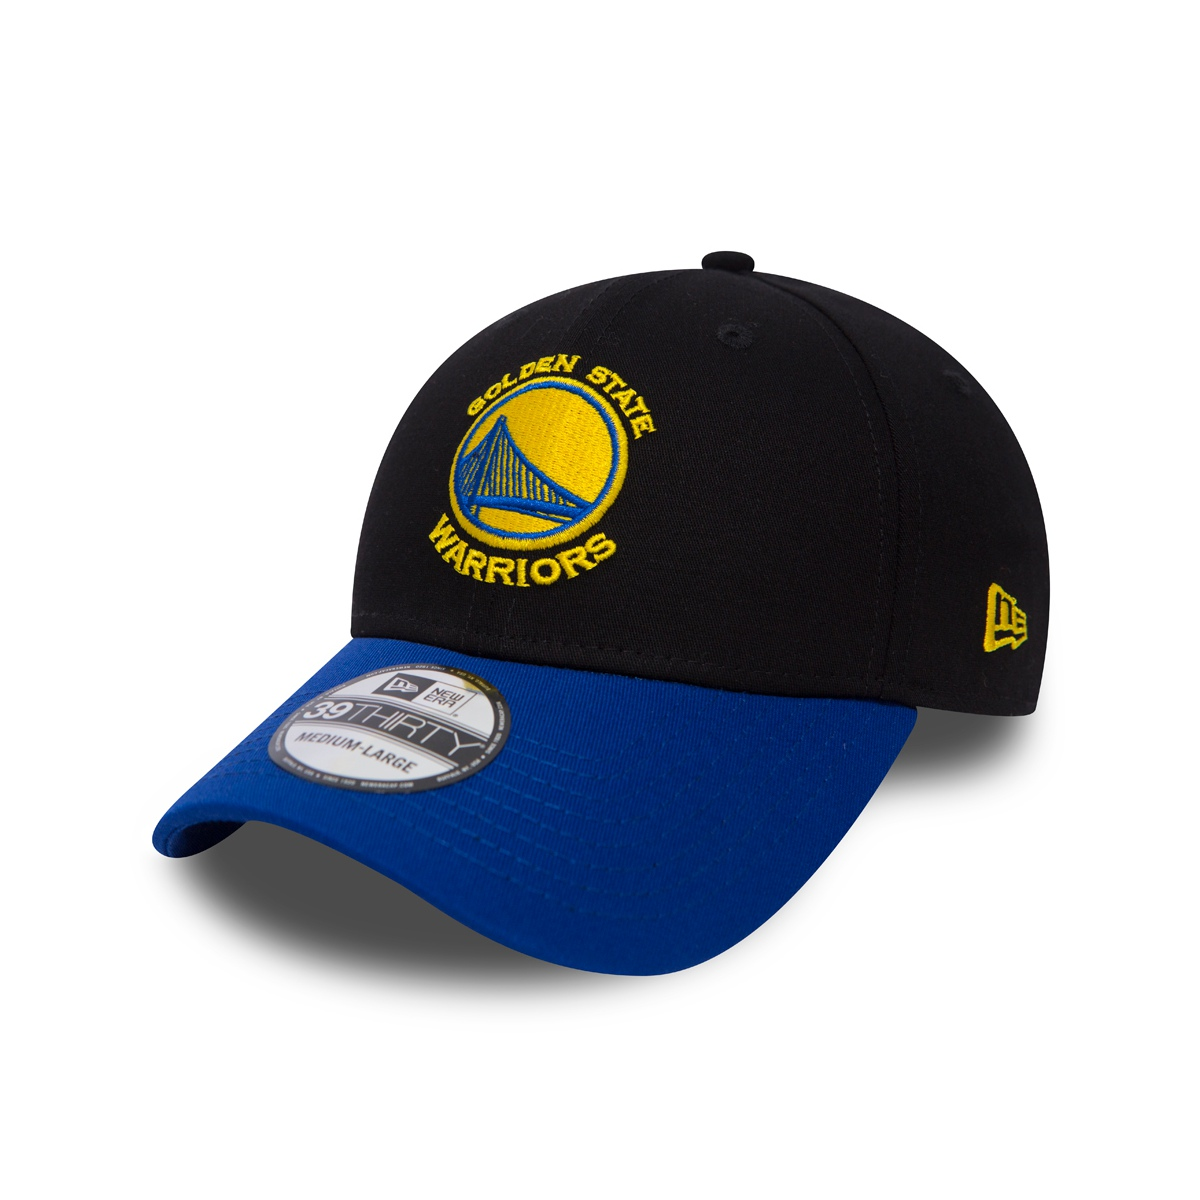 a18739631f52b New Era Black Base Golden State Warriors 39THIRTY